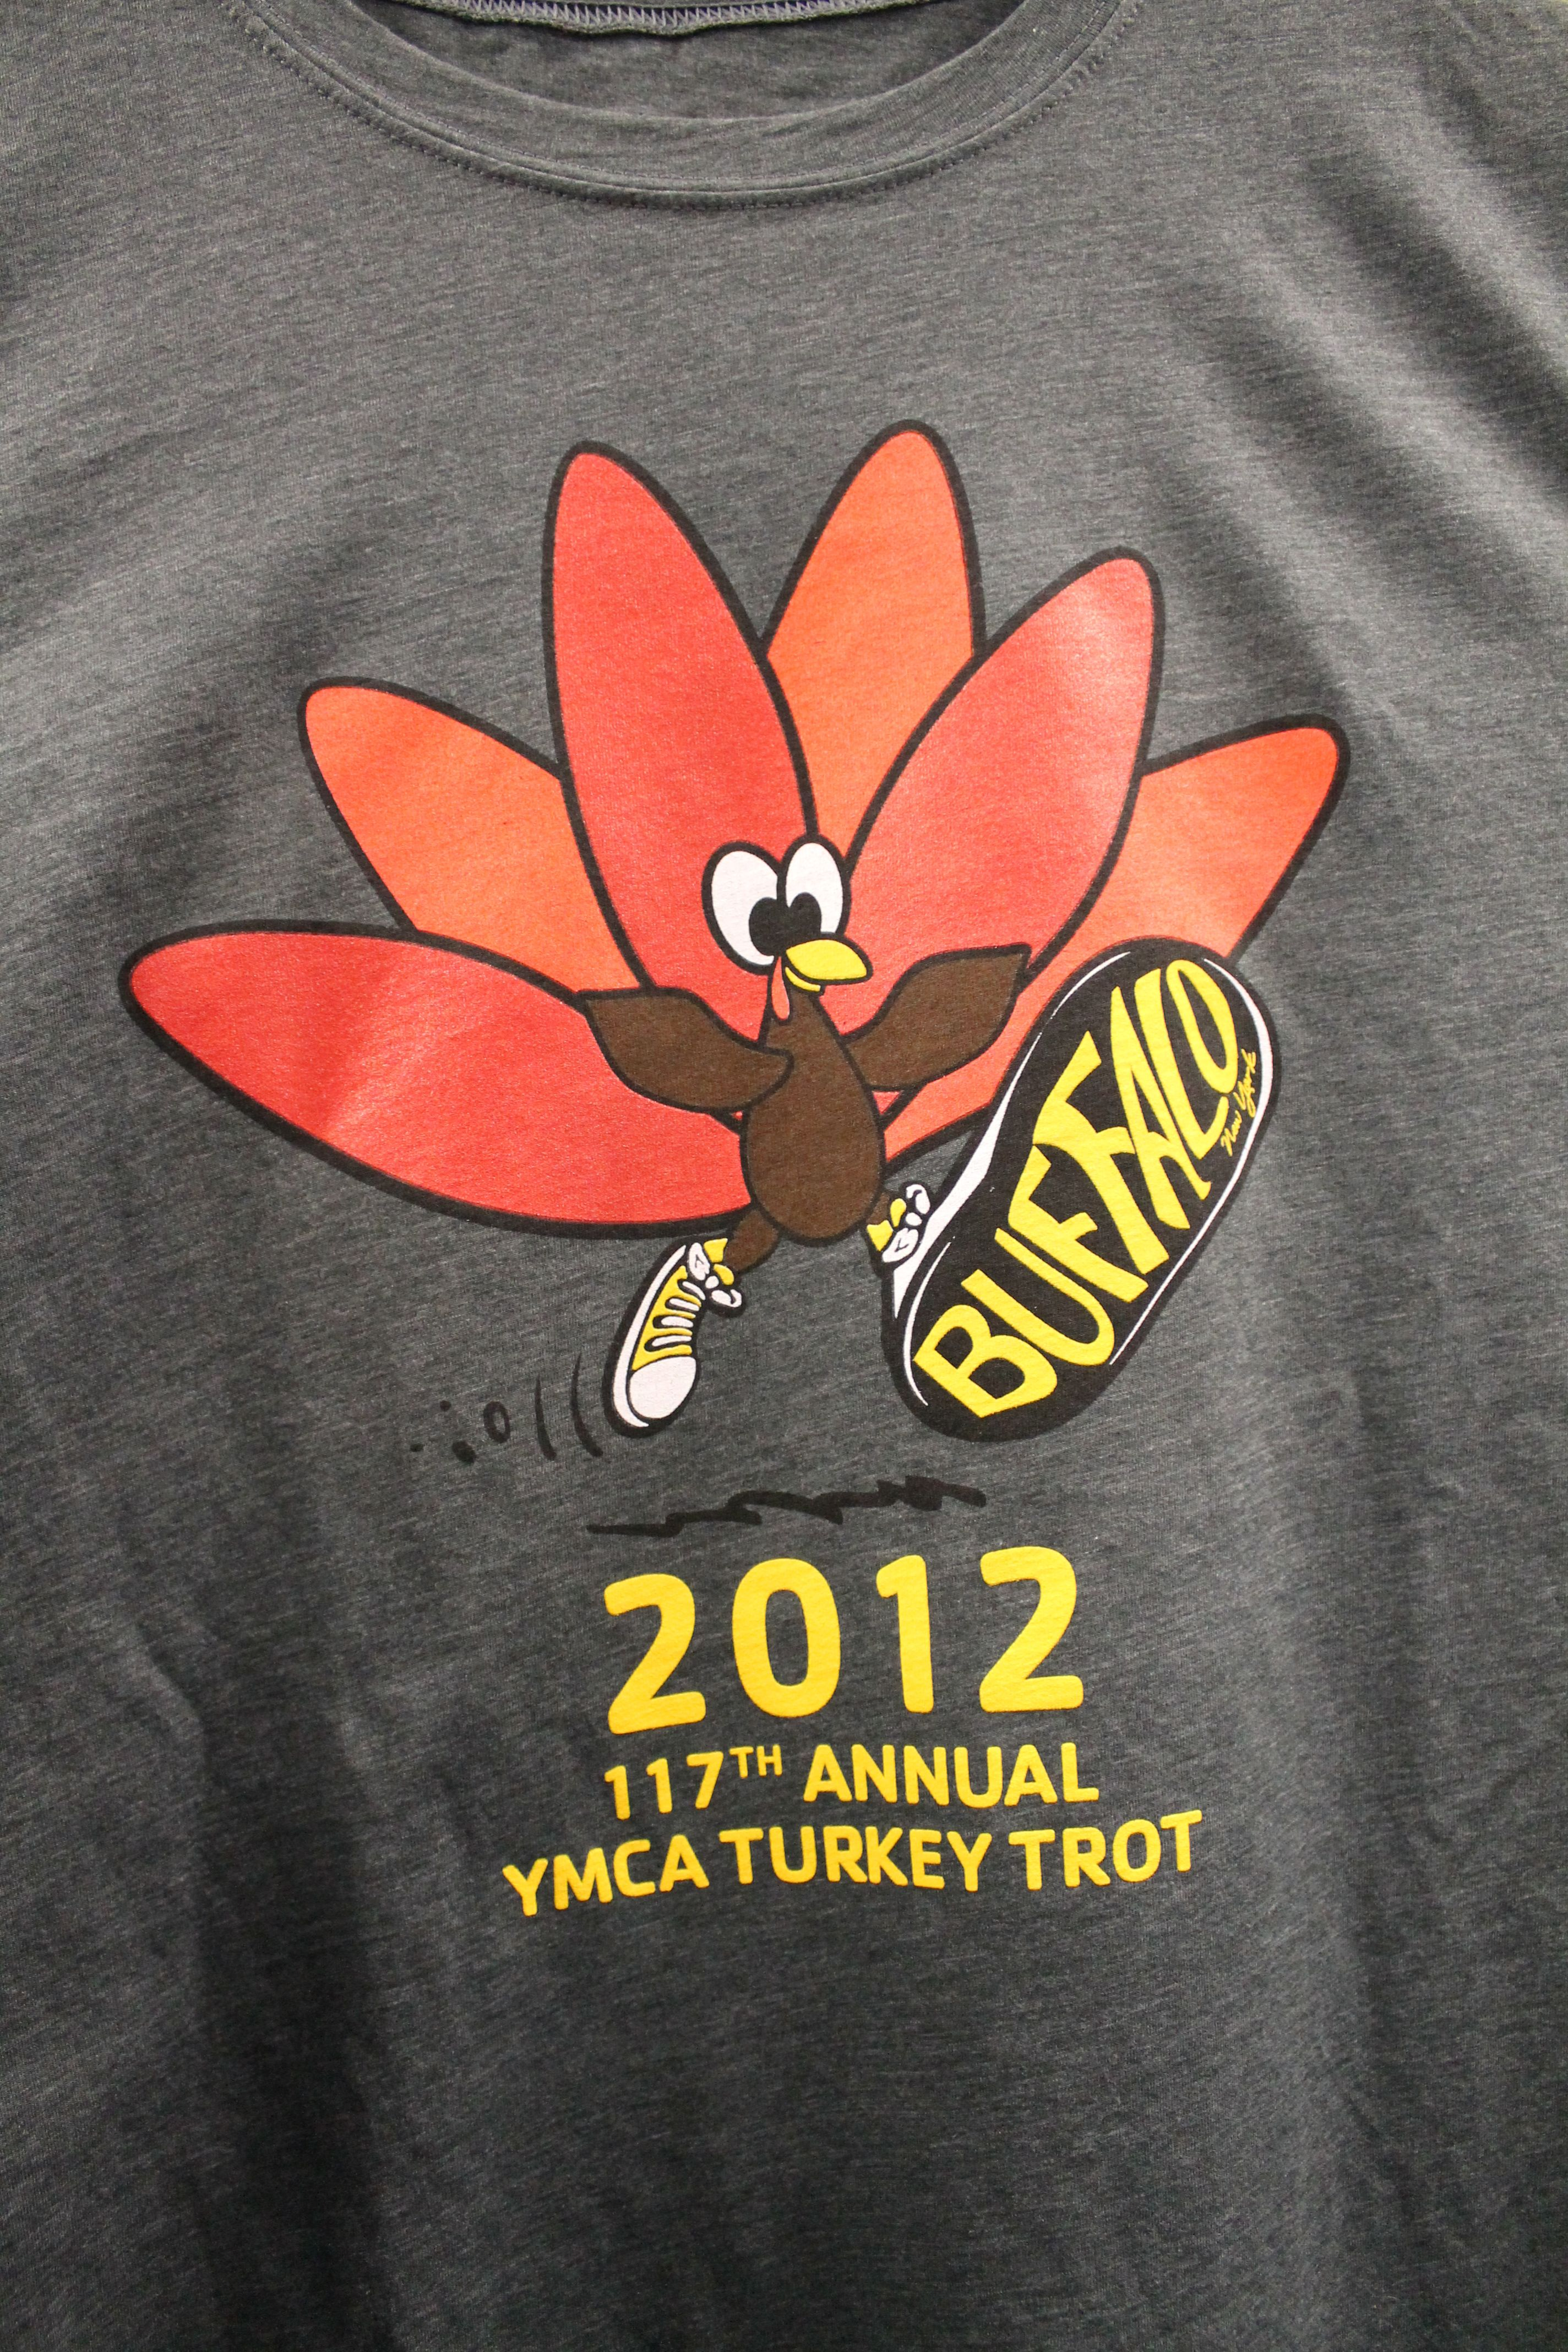 2012 Turkey Trot T Shirt Designed By Ryan Thompson Of North Tonawanda Ny Turkey Trot Turkey Shirts Trot